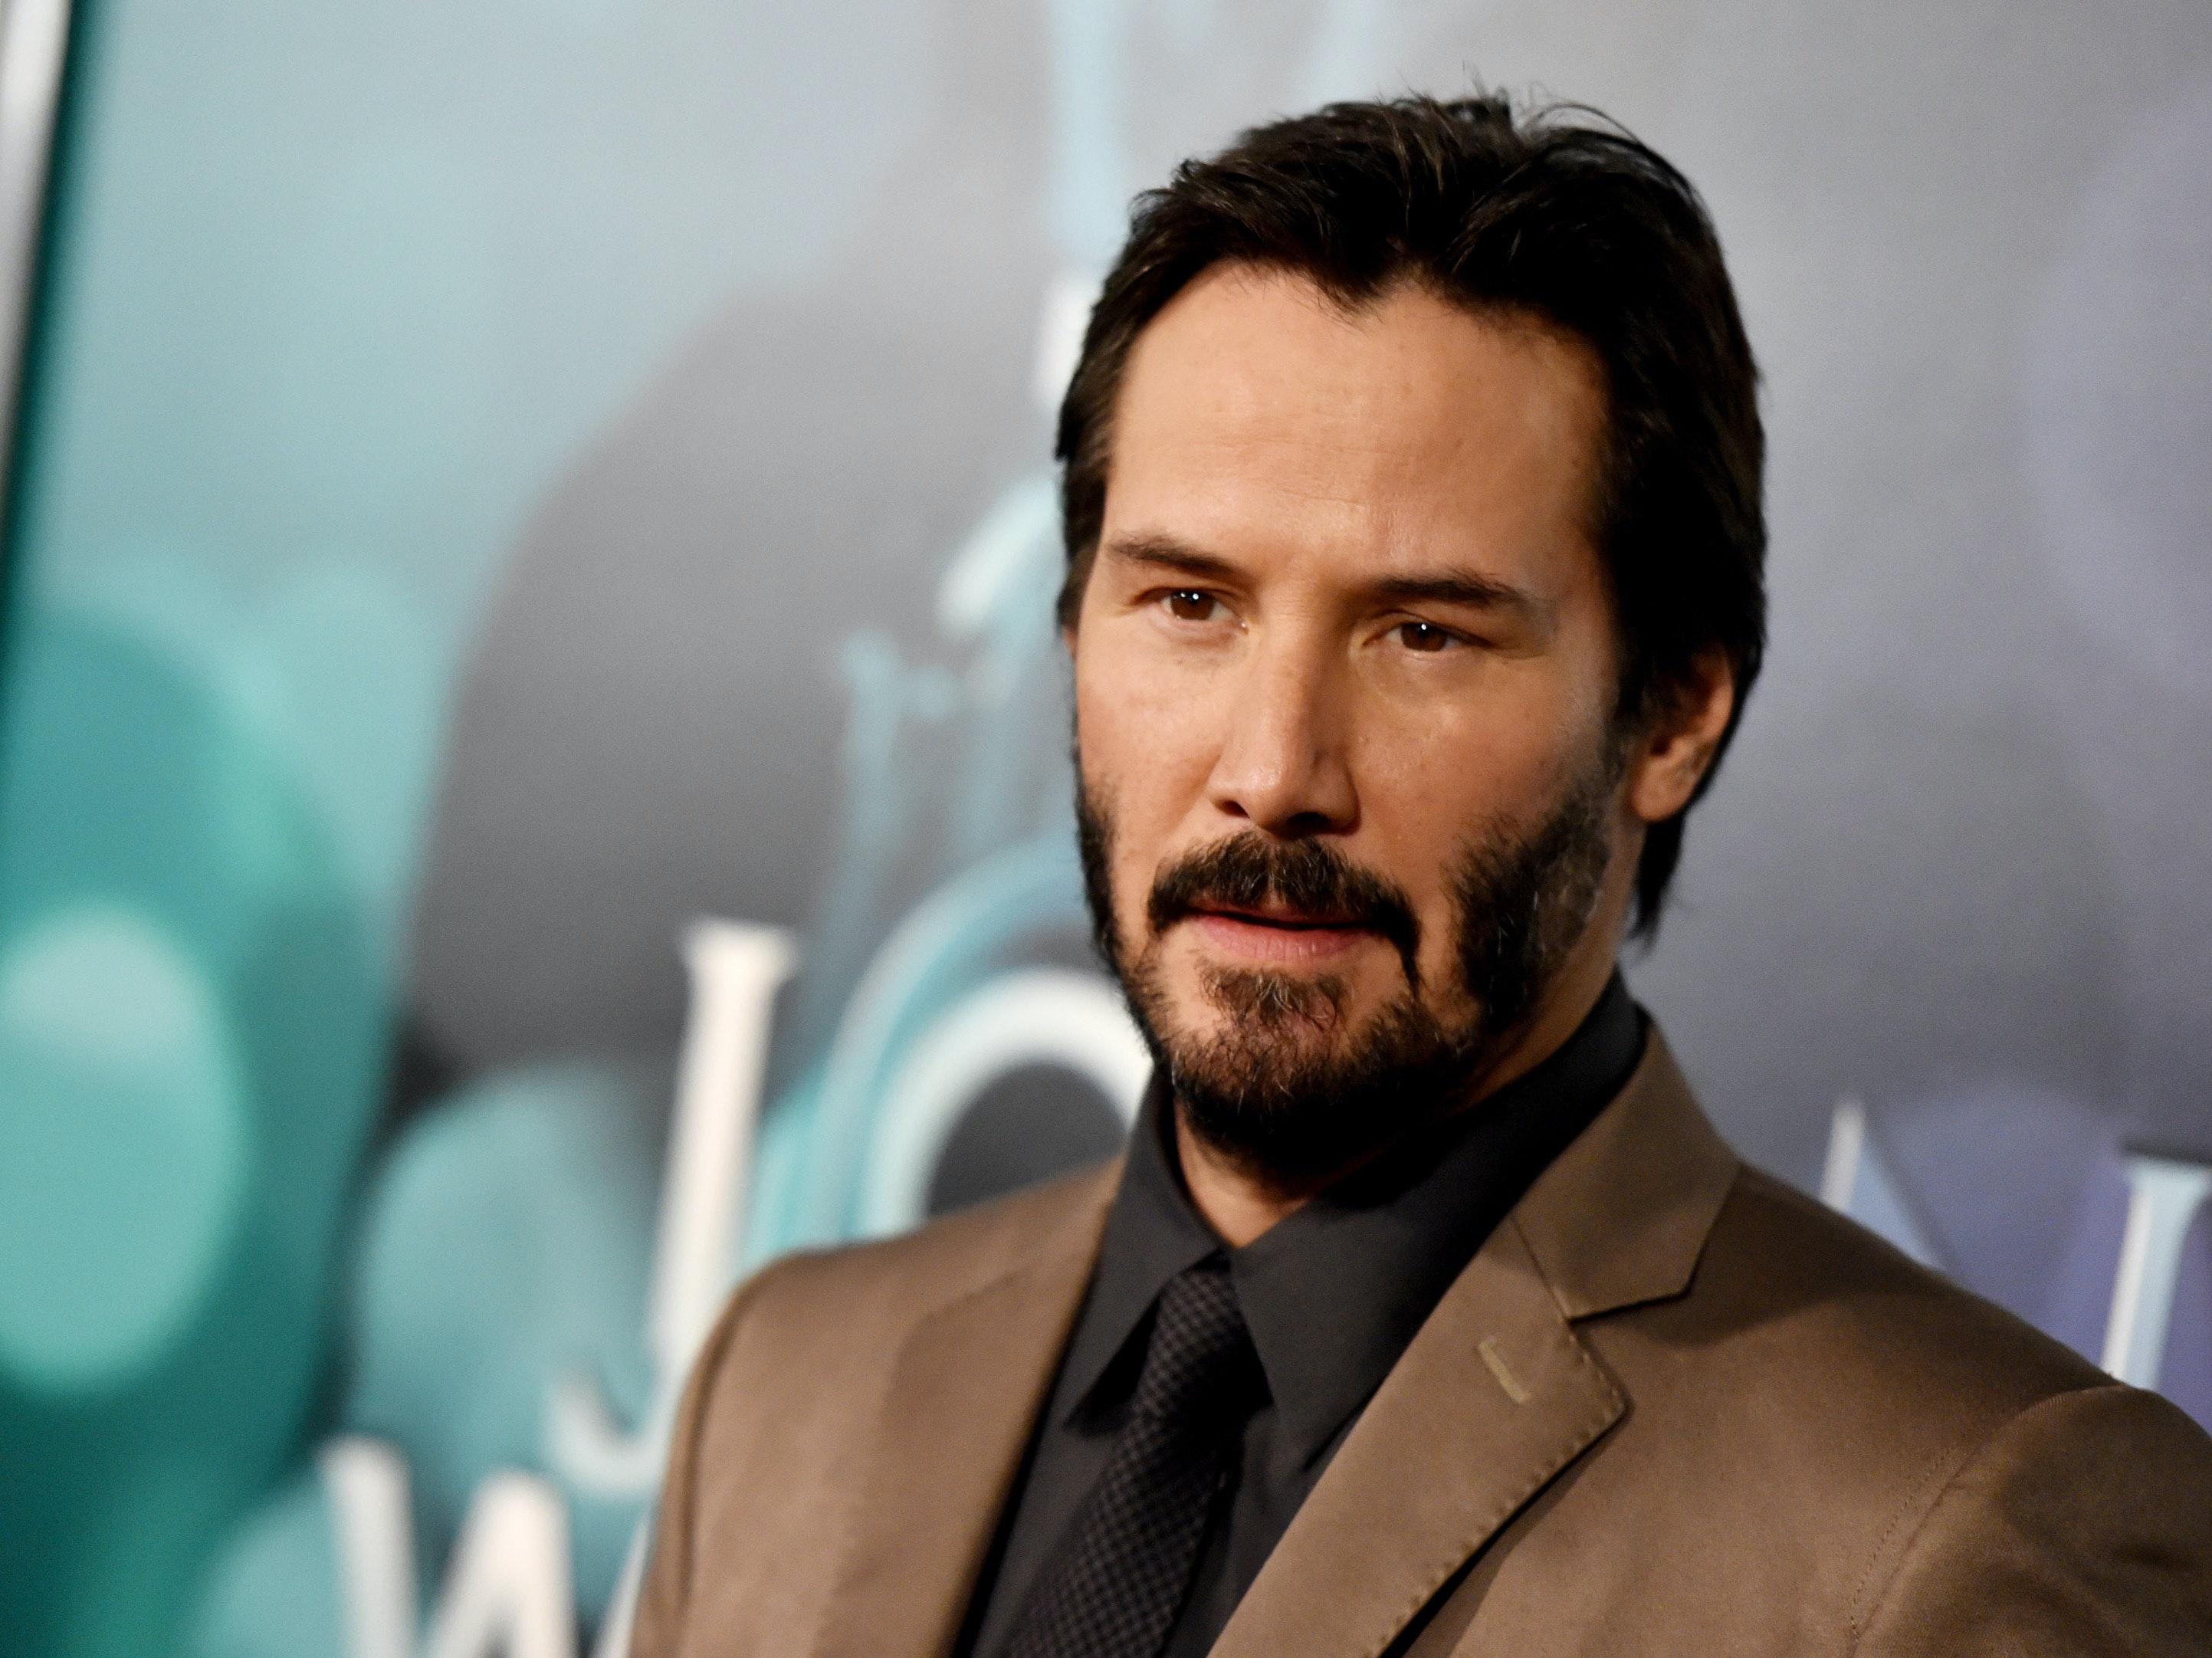 Keanu Reeves Reunites With Laurence Fishburne in 'John Wick 2' Set Photos